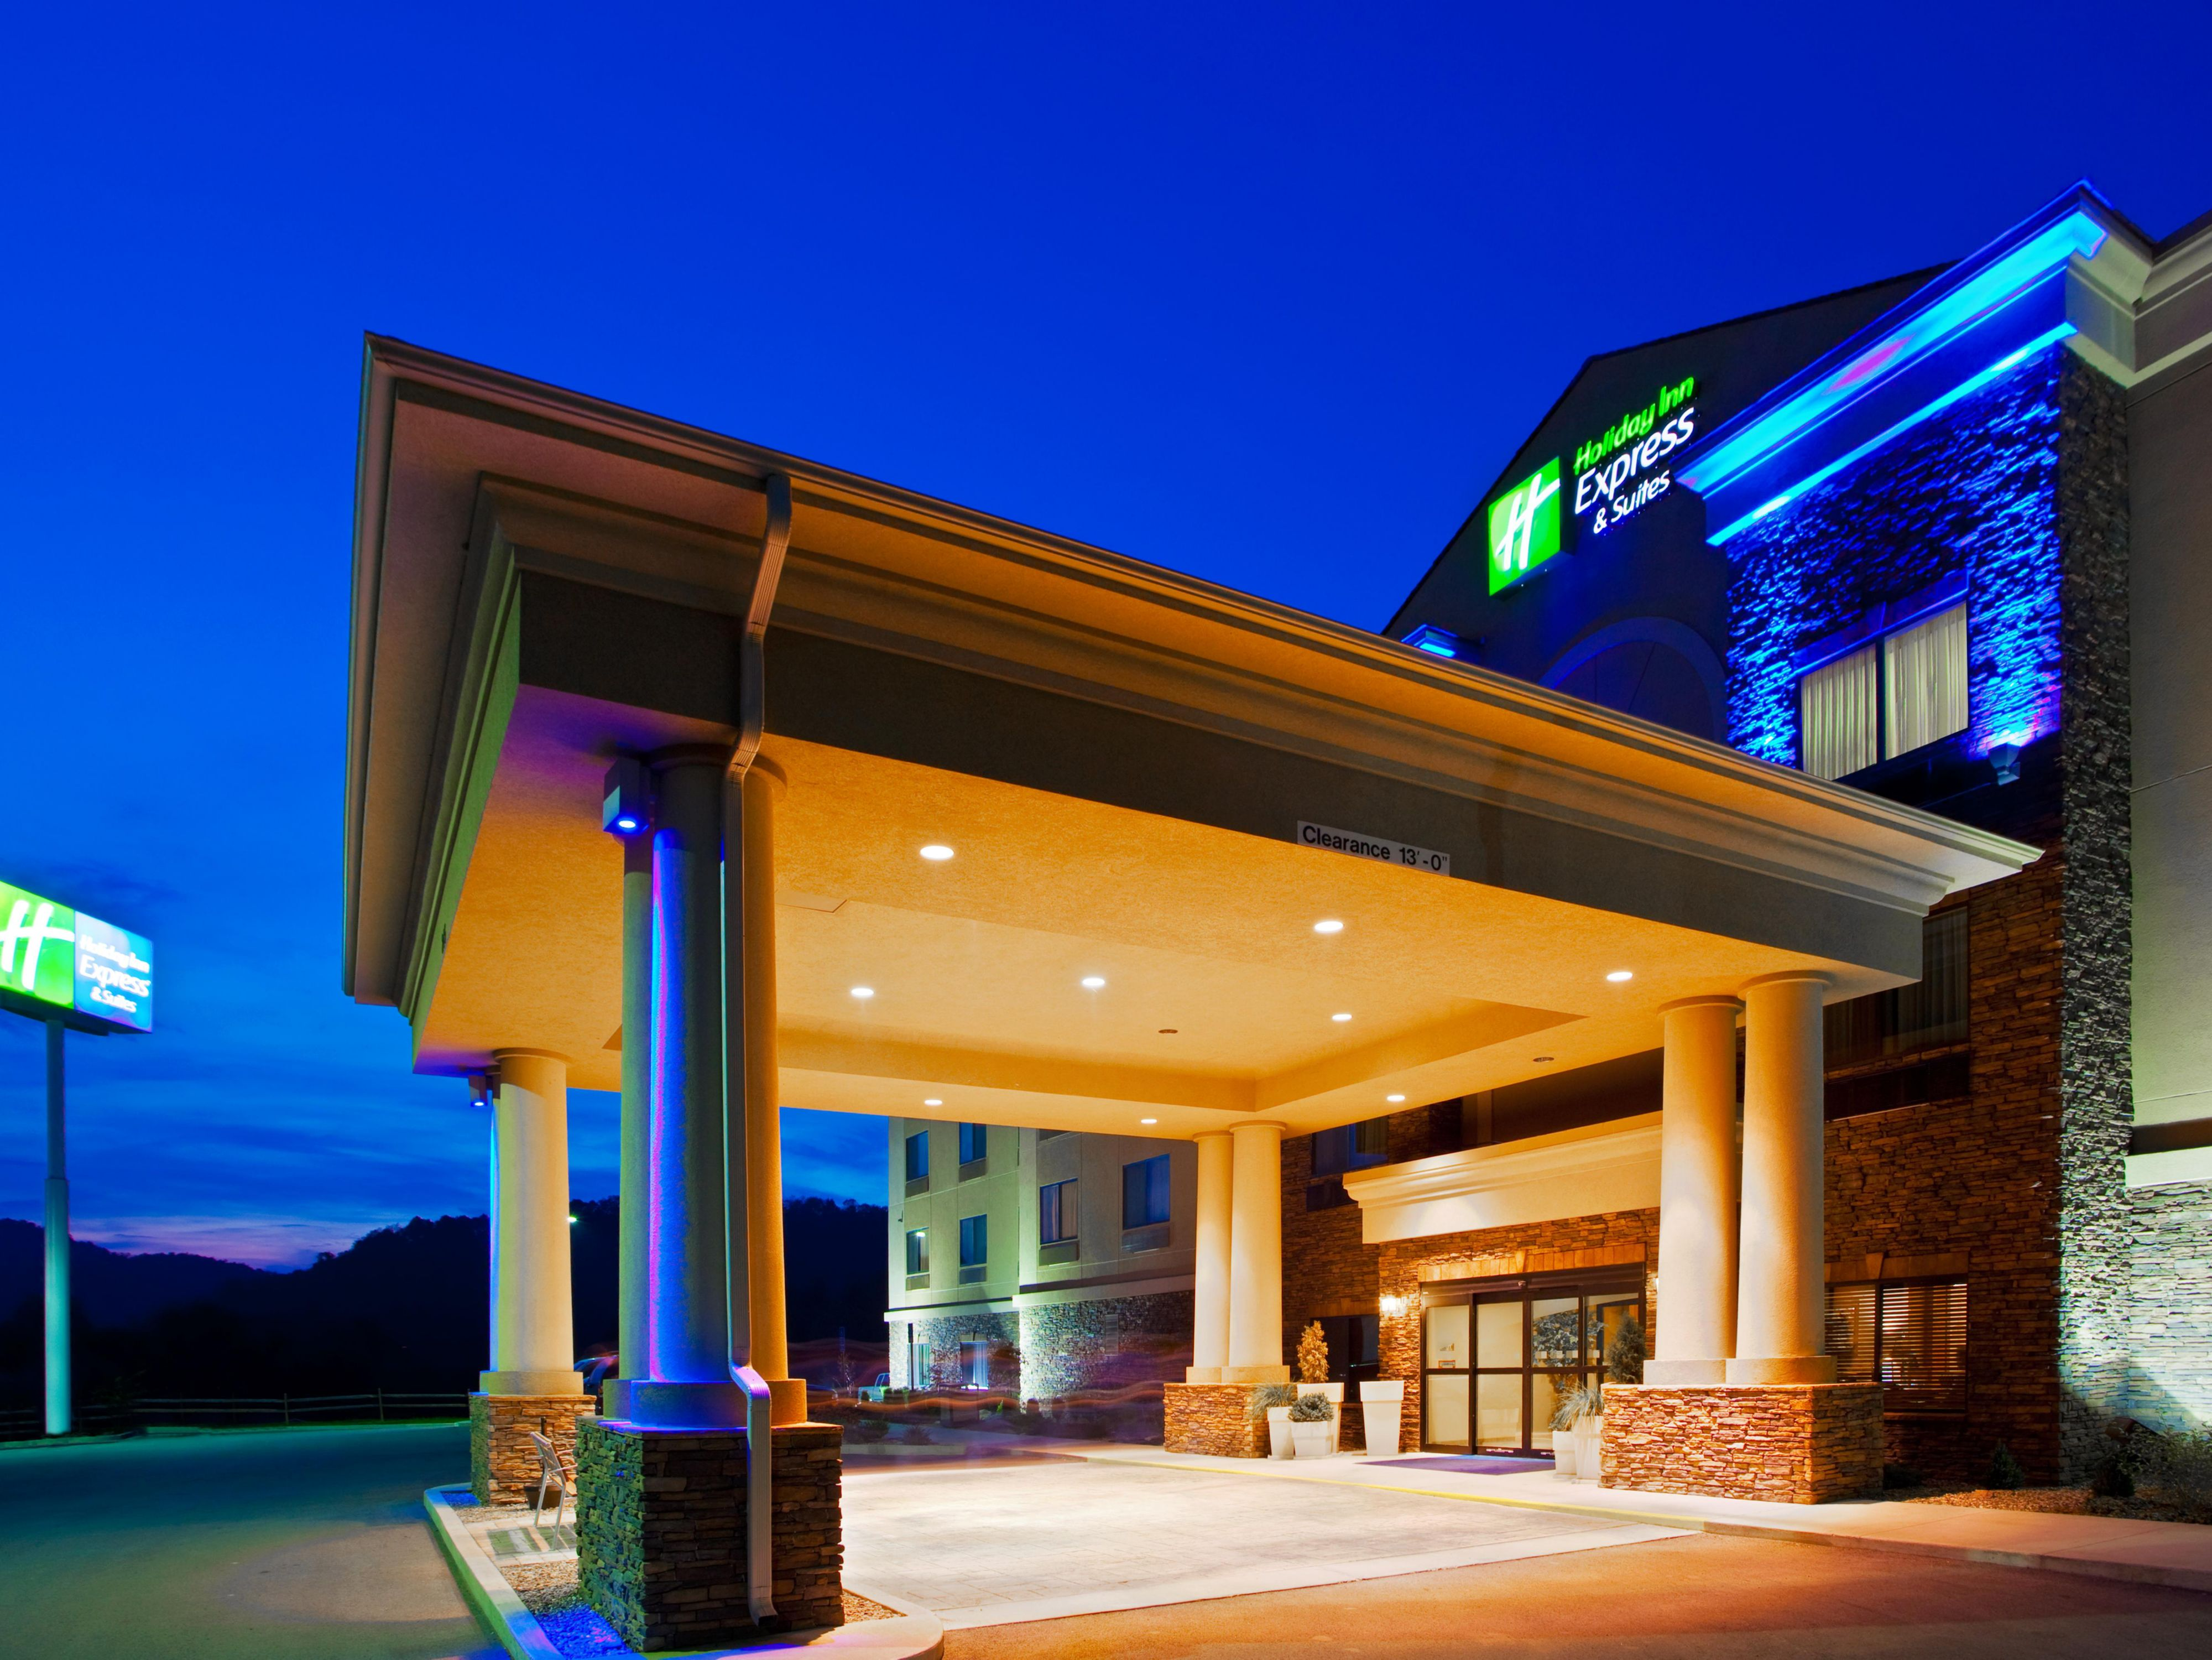 Holiday Inn Express  U0026 Suites Weston Hotel By Ihg